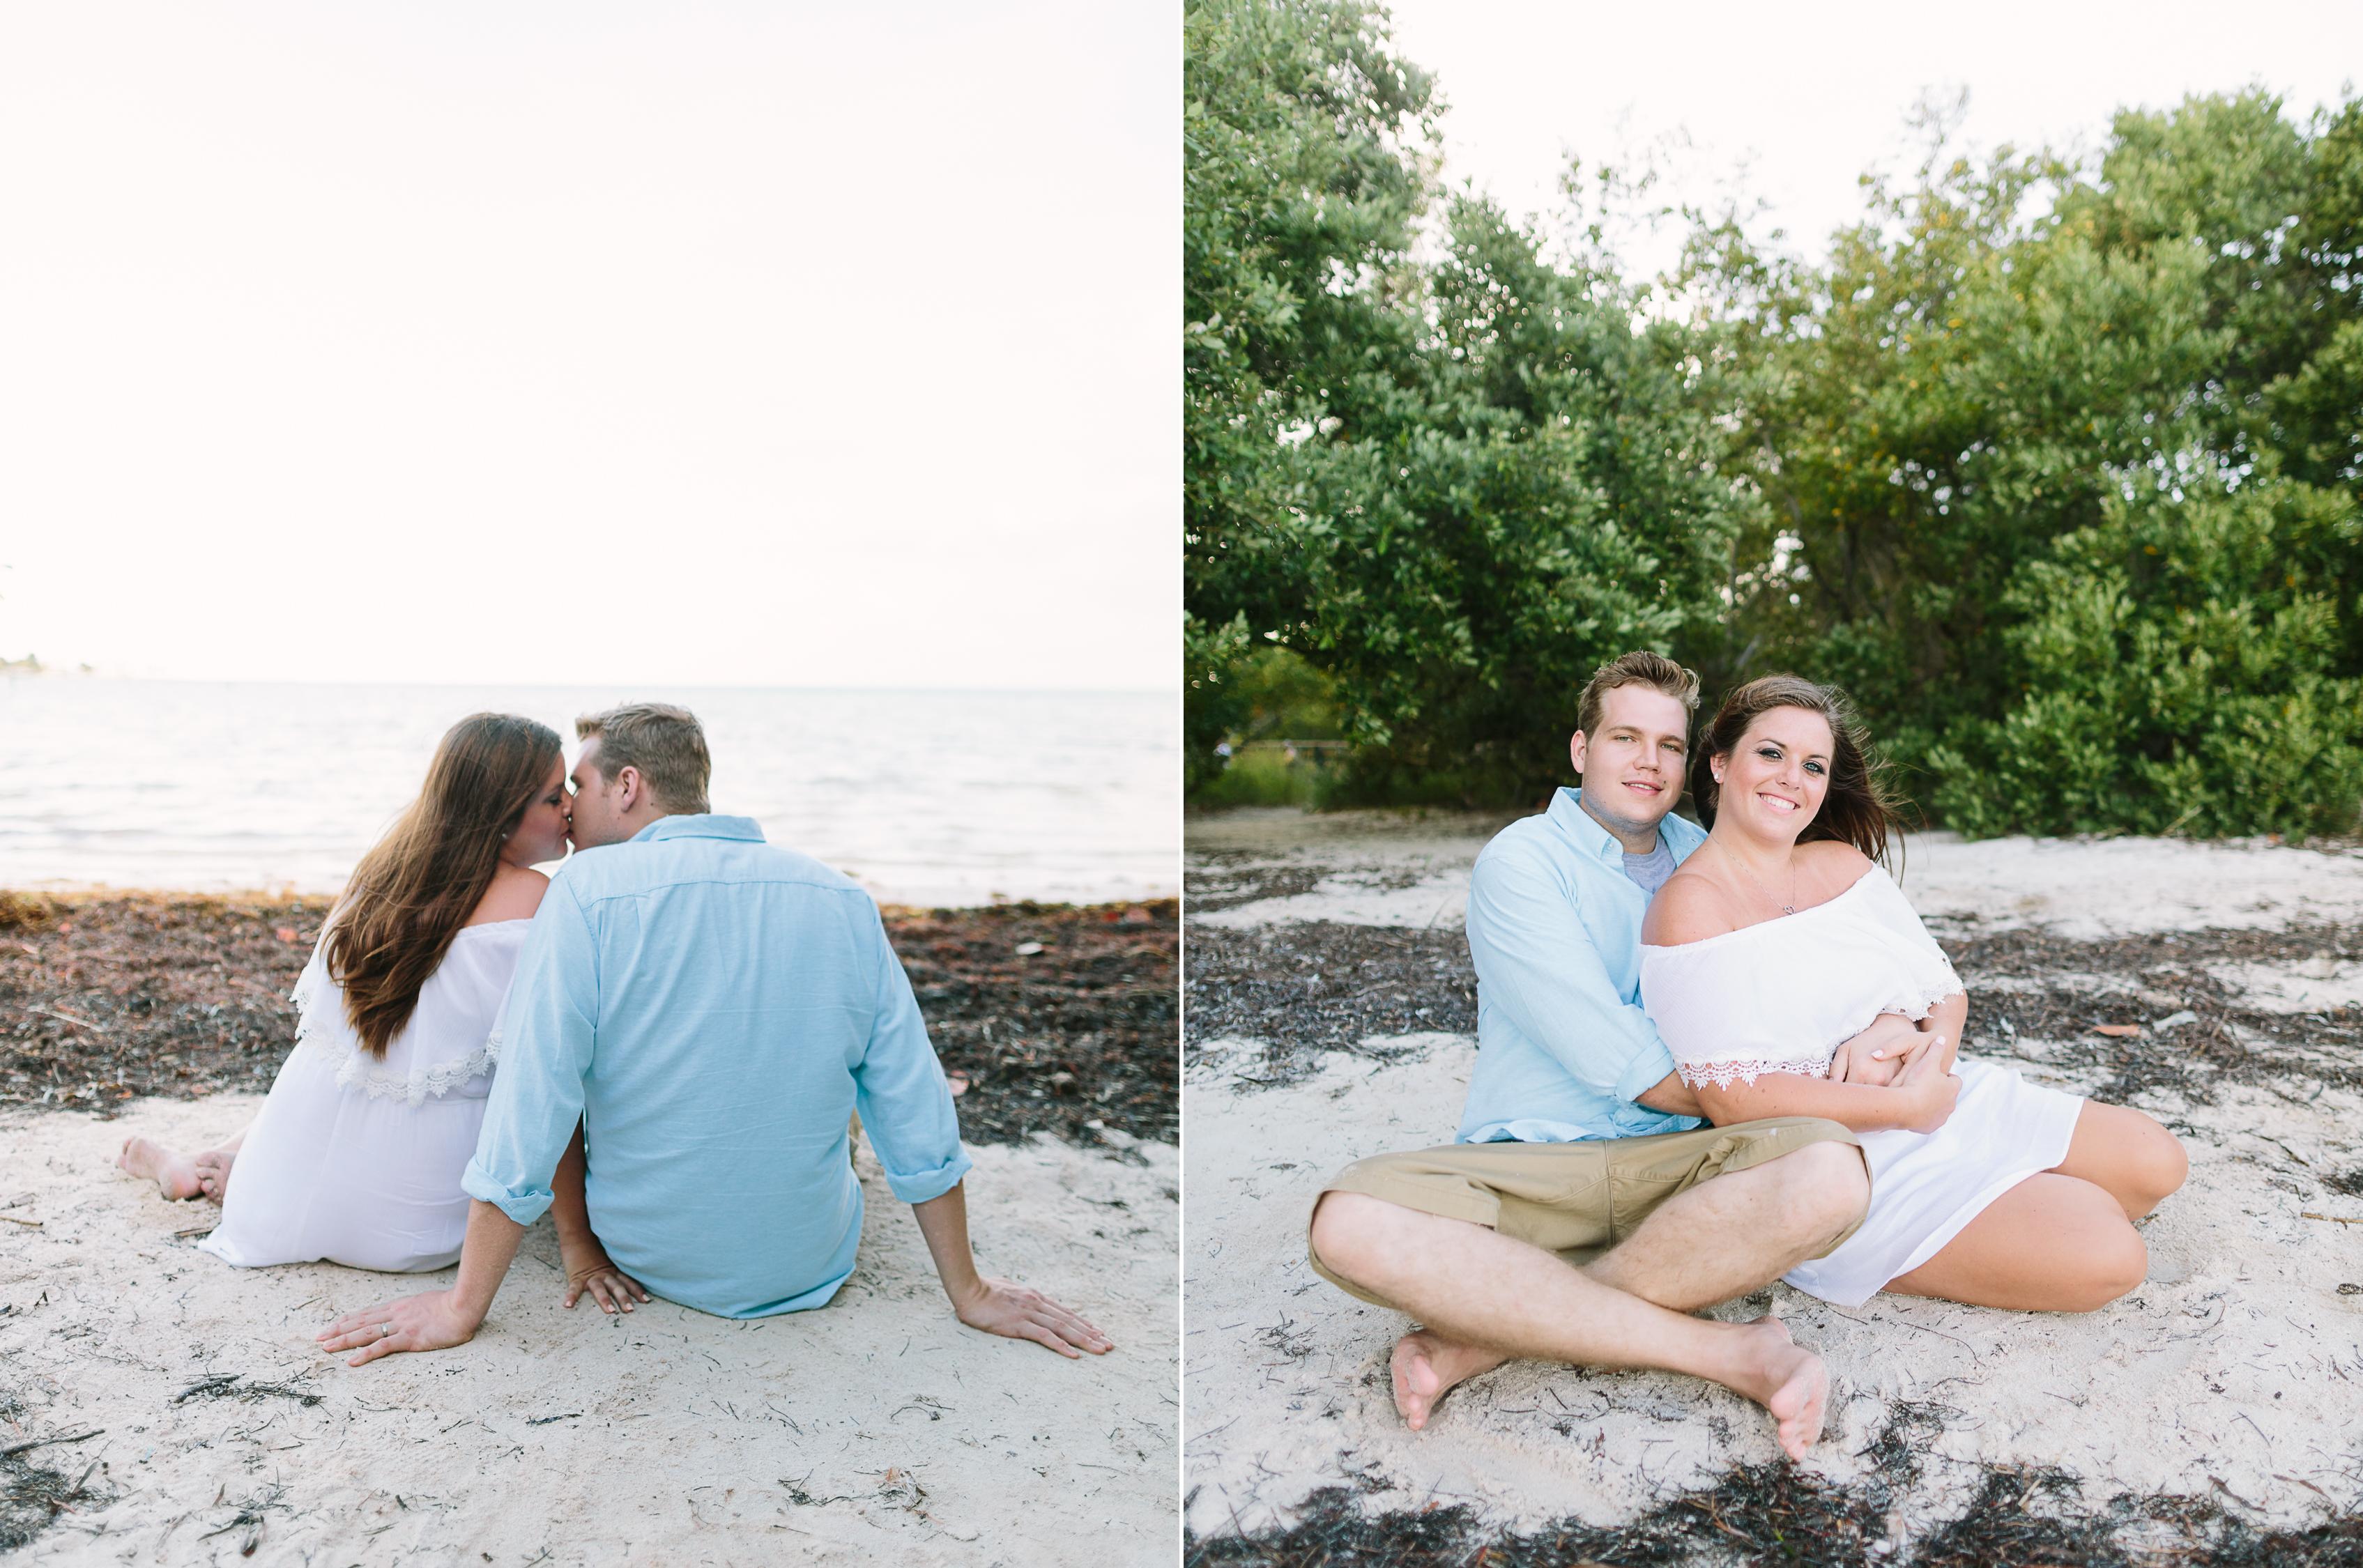 Islamorada Engagement session, Islamorada Florida Weddings, Islamorada photographer, Florida Keys photographers02